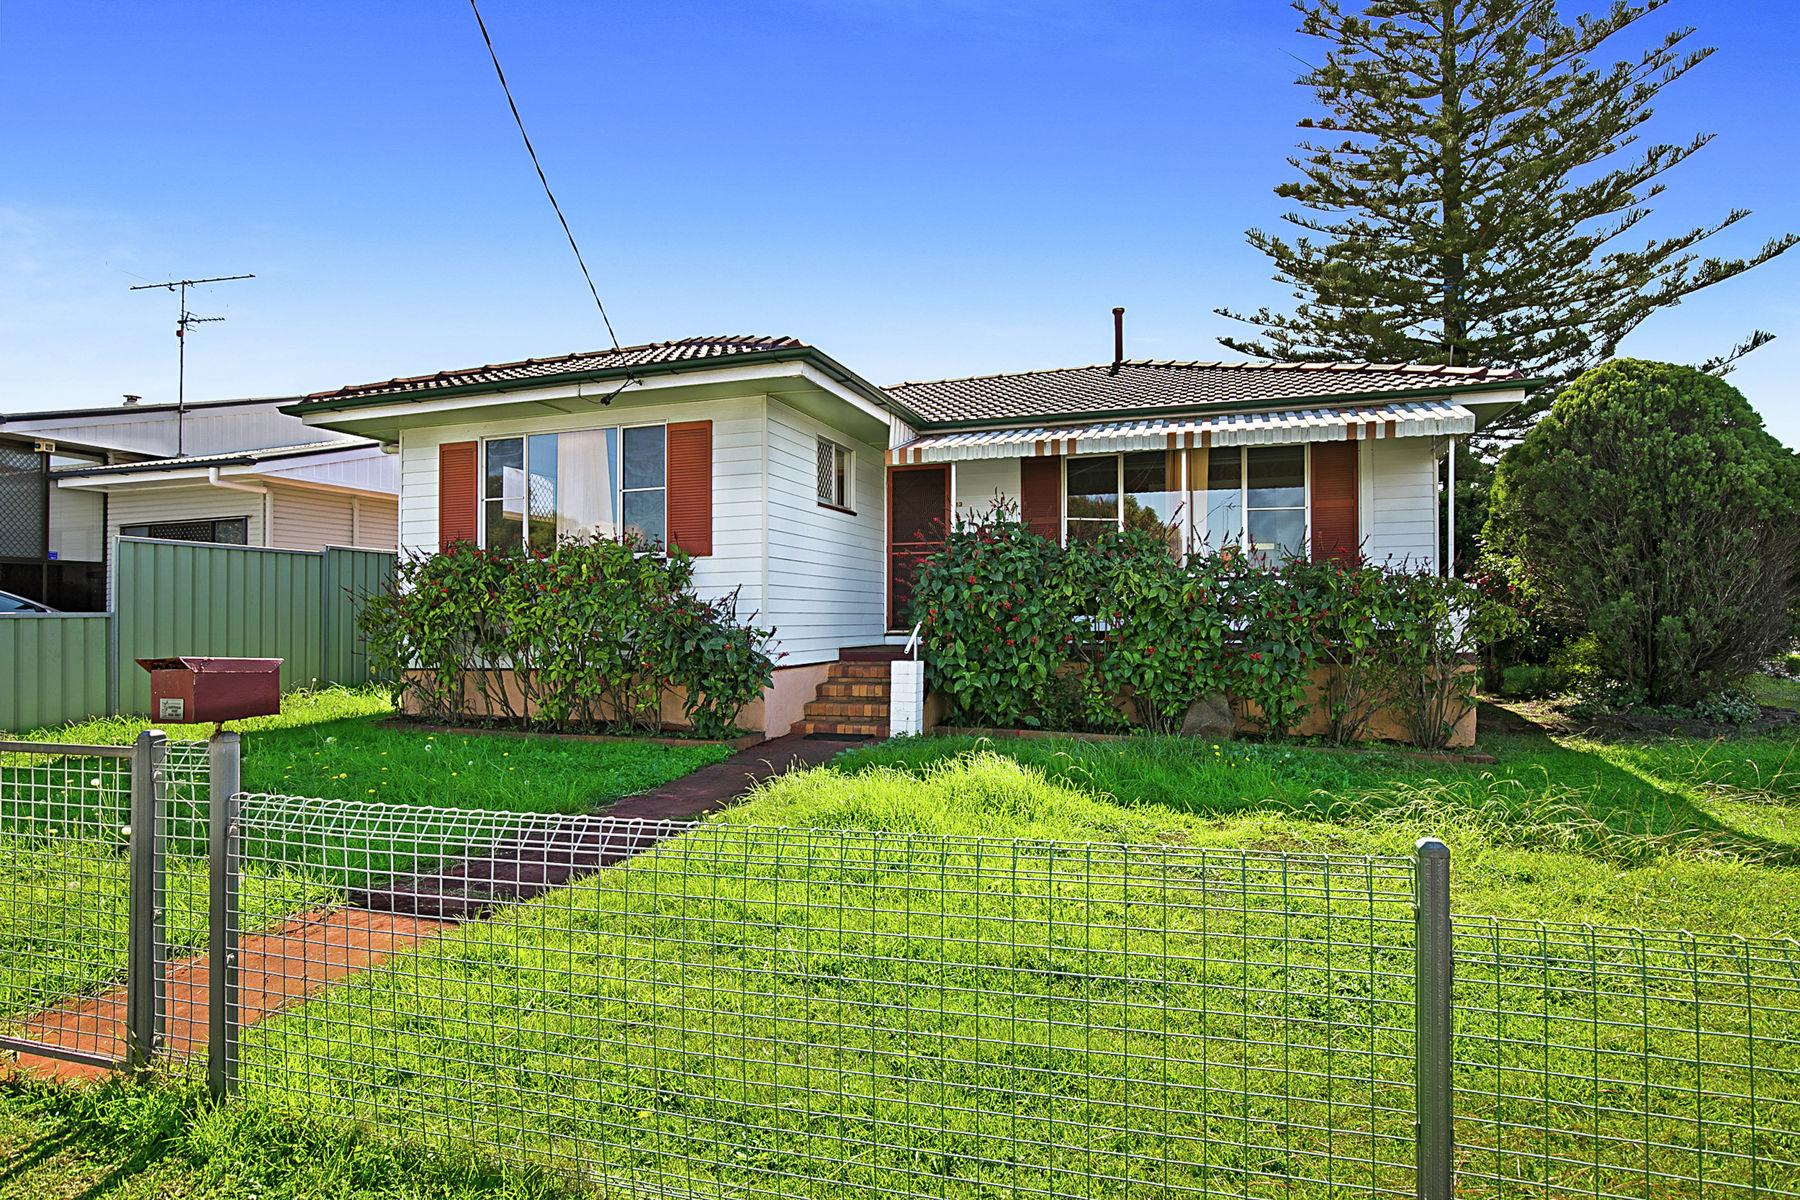 Property in Wilsonton - Sold for $240,000